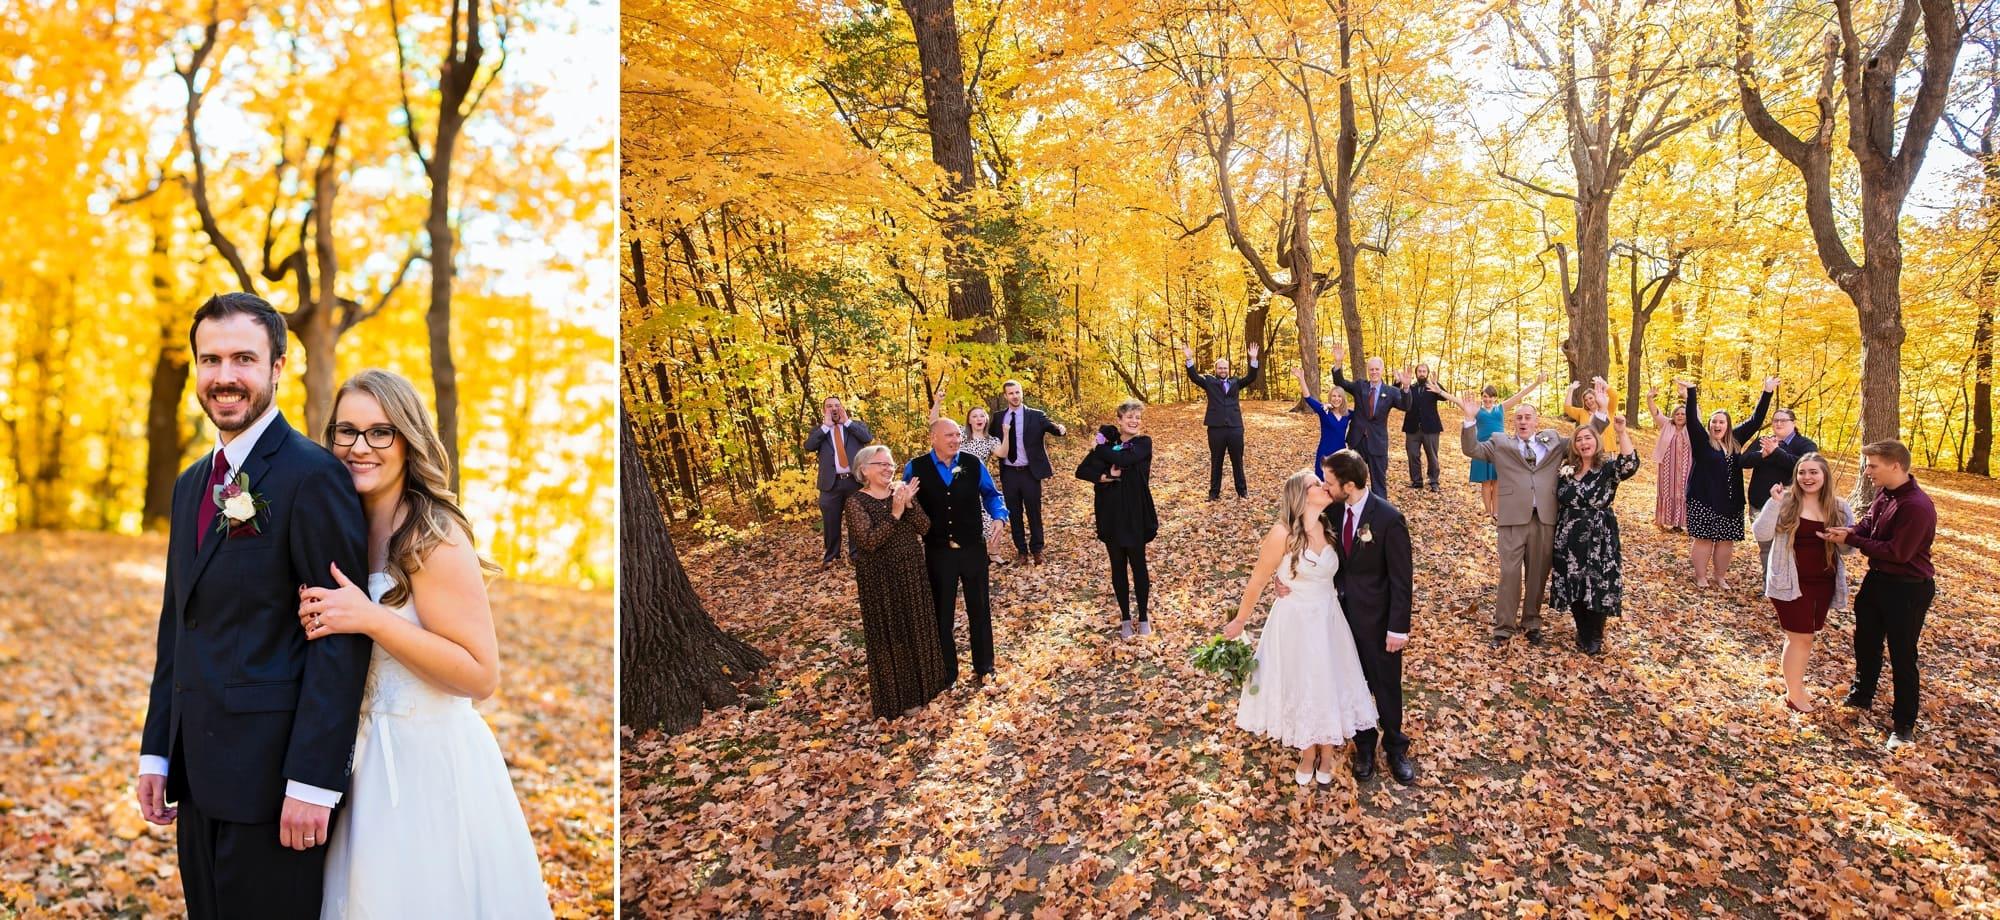 Wedding ceremony photograph at Lake Minnewashta, in Chanhassen, Minnesota.